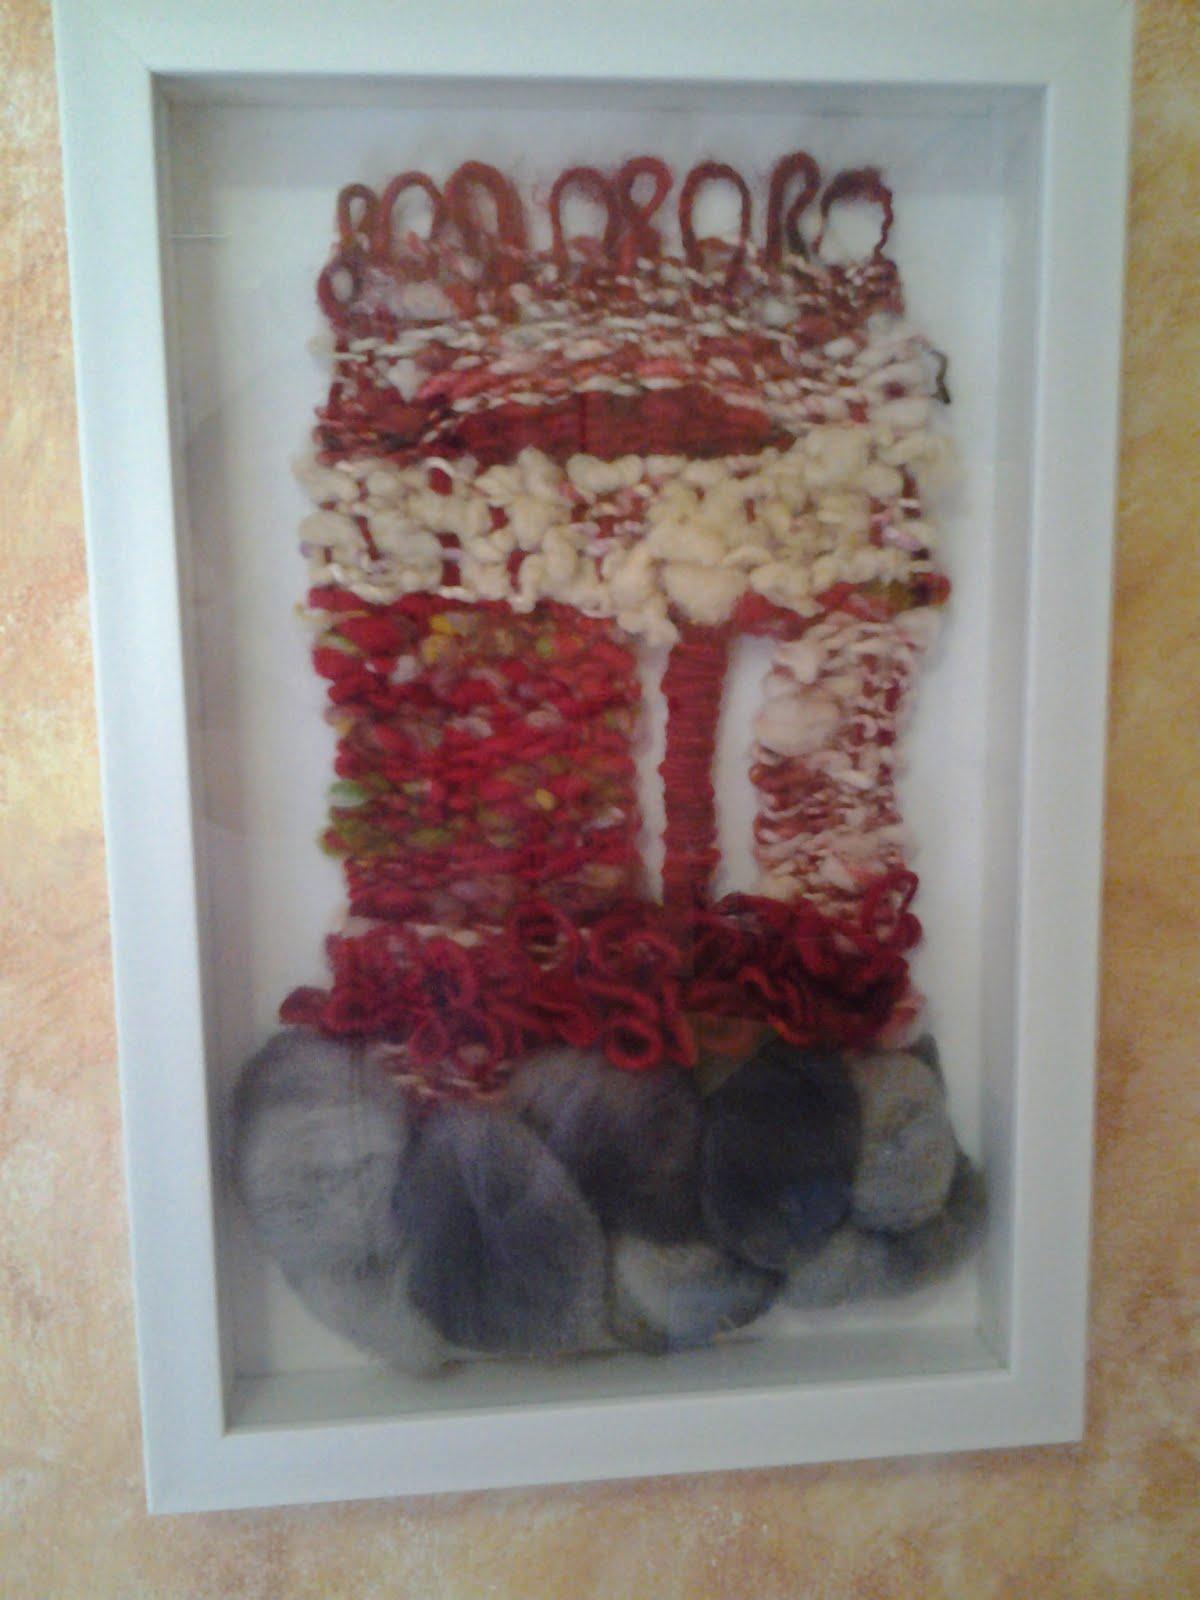 almatelar murales y tapices: tapices 2012 enmarcados